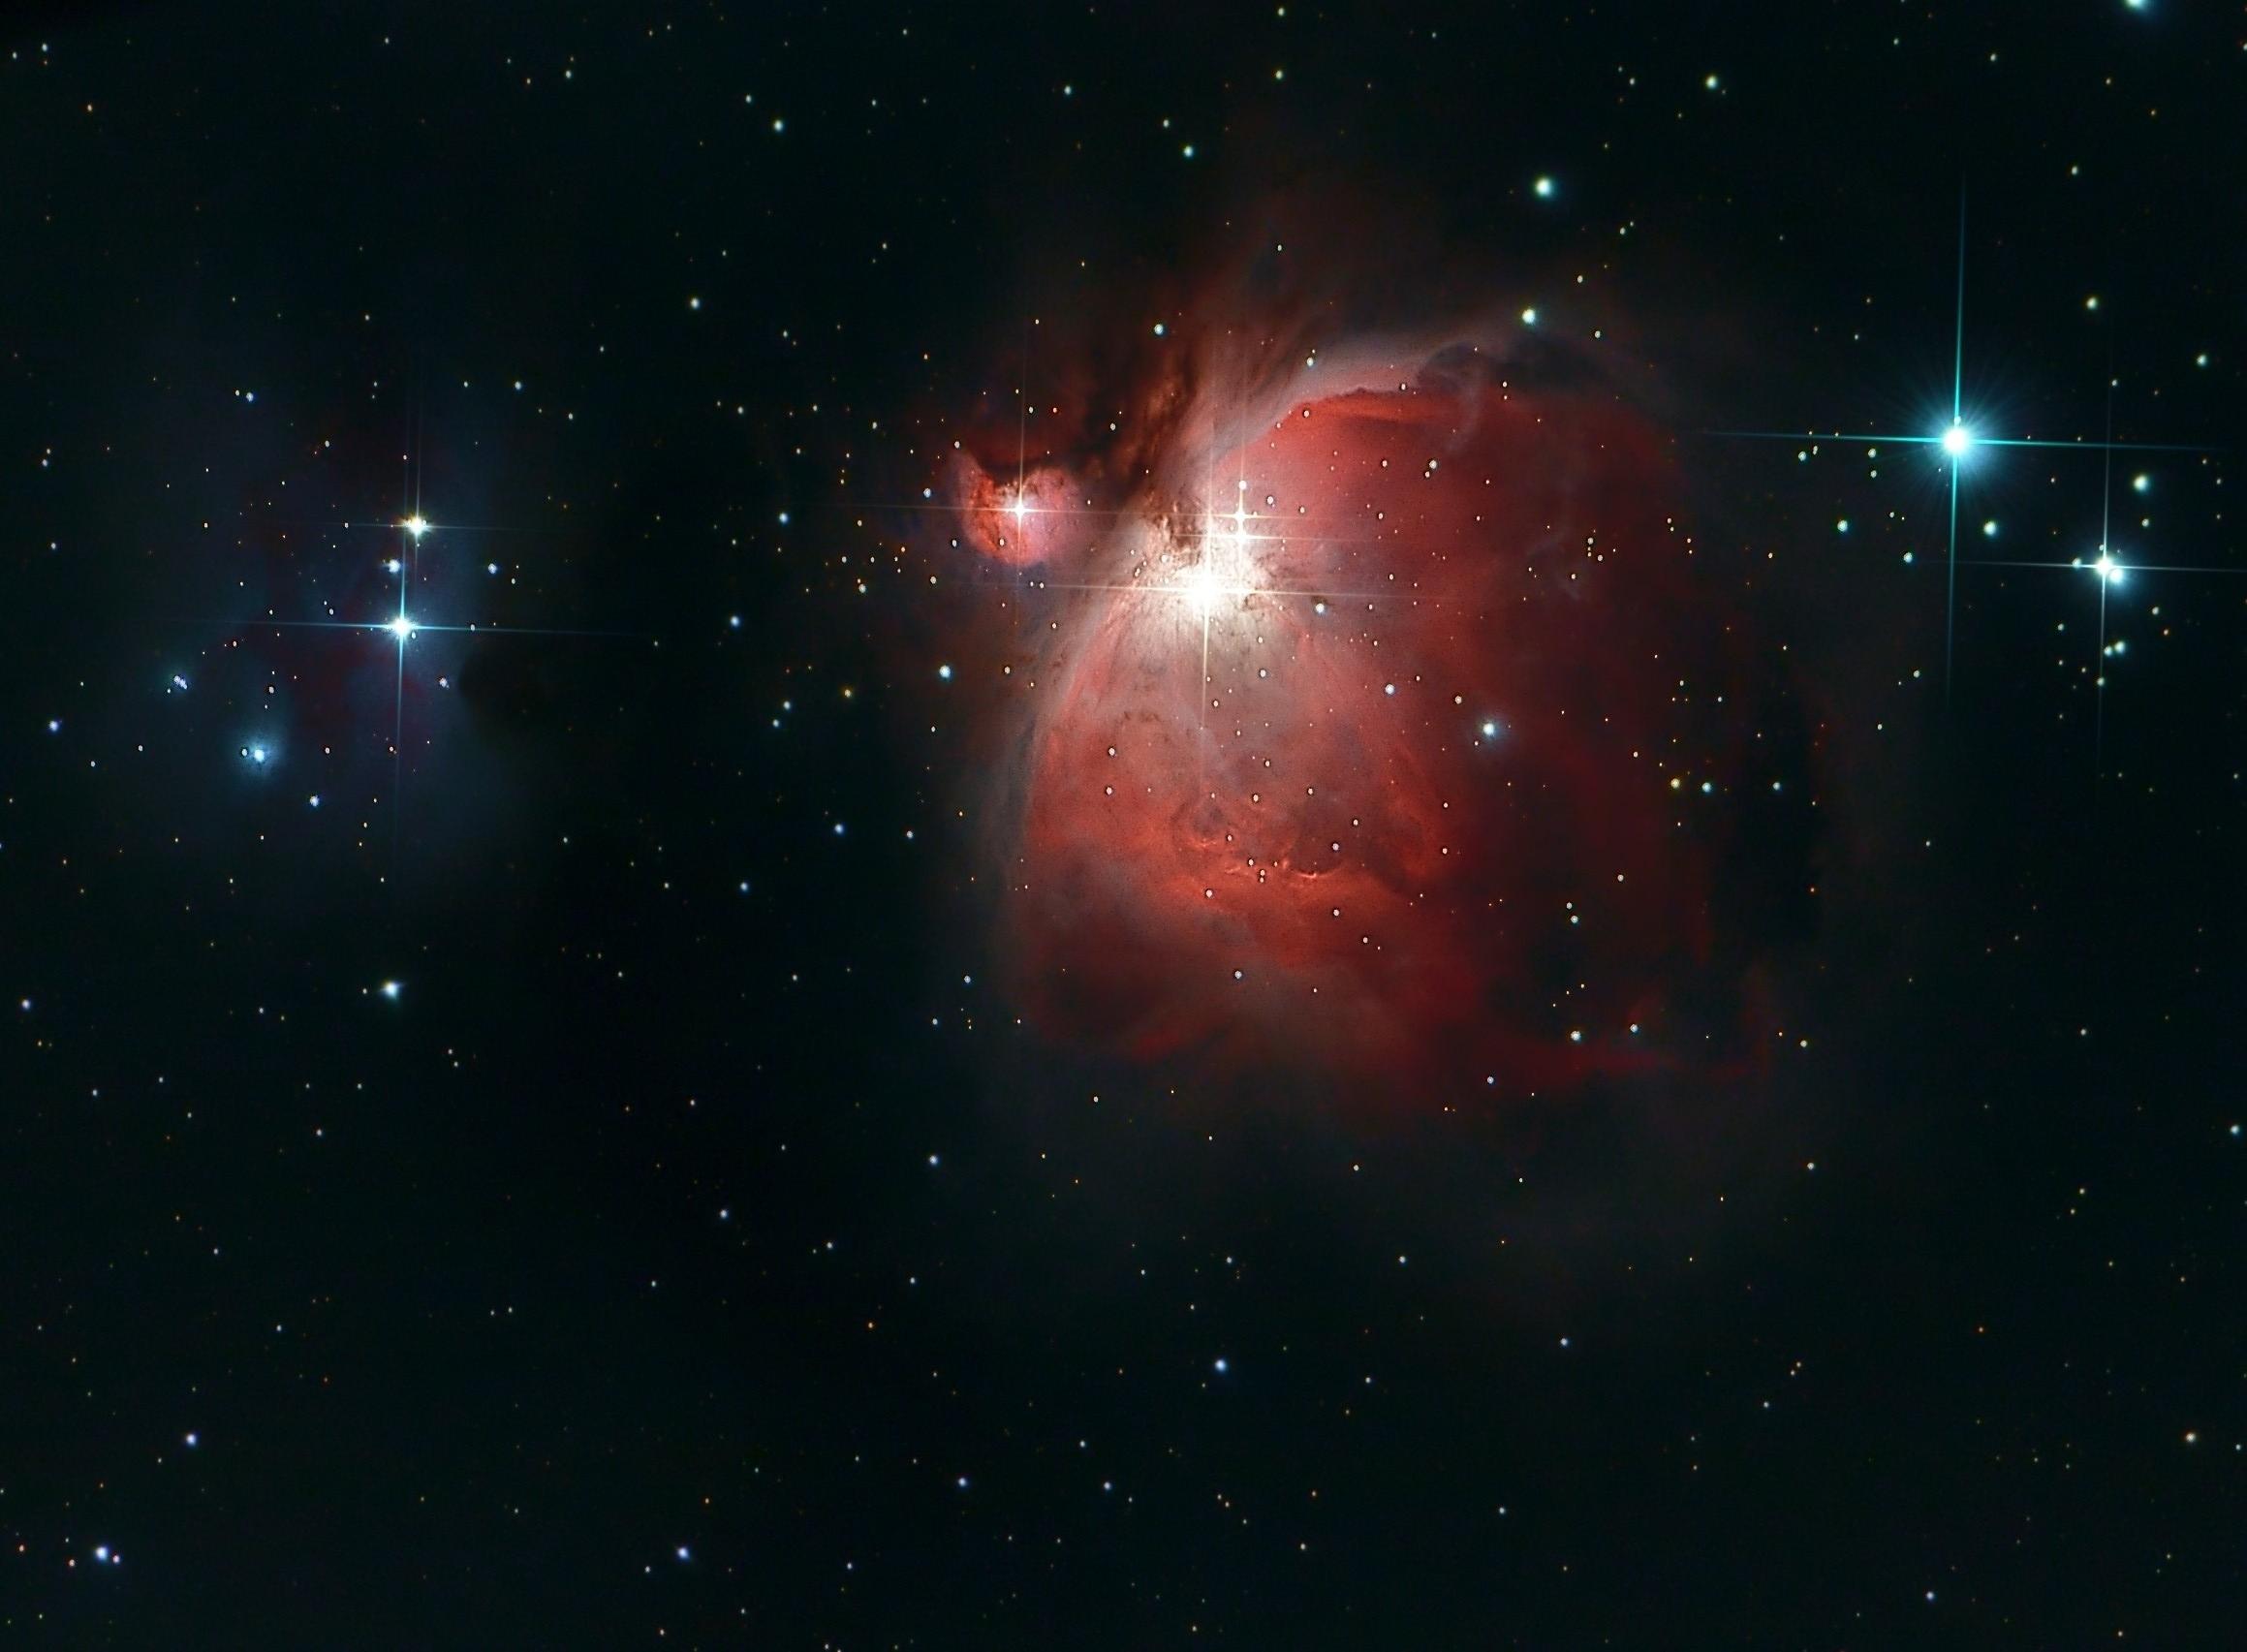 M42 - Orion Nebula